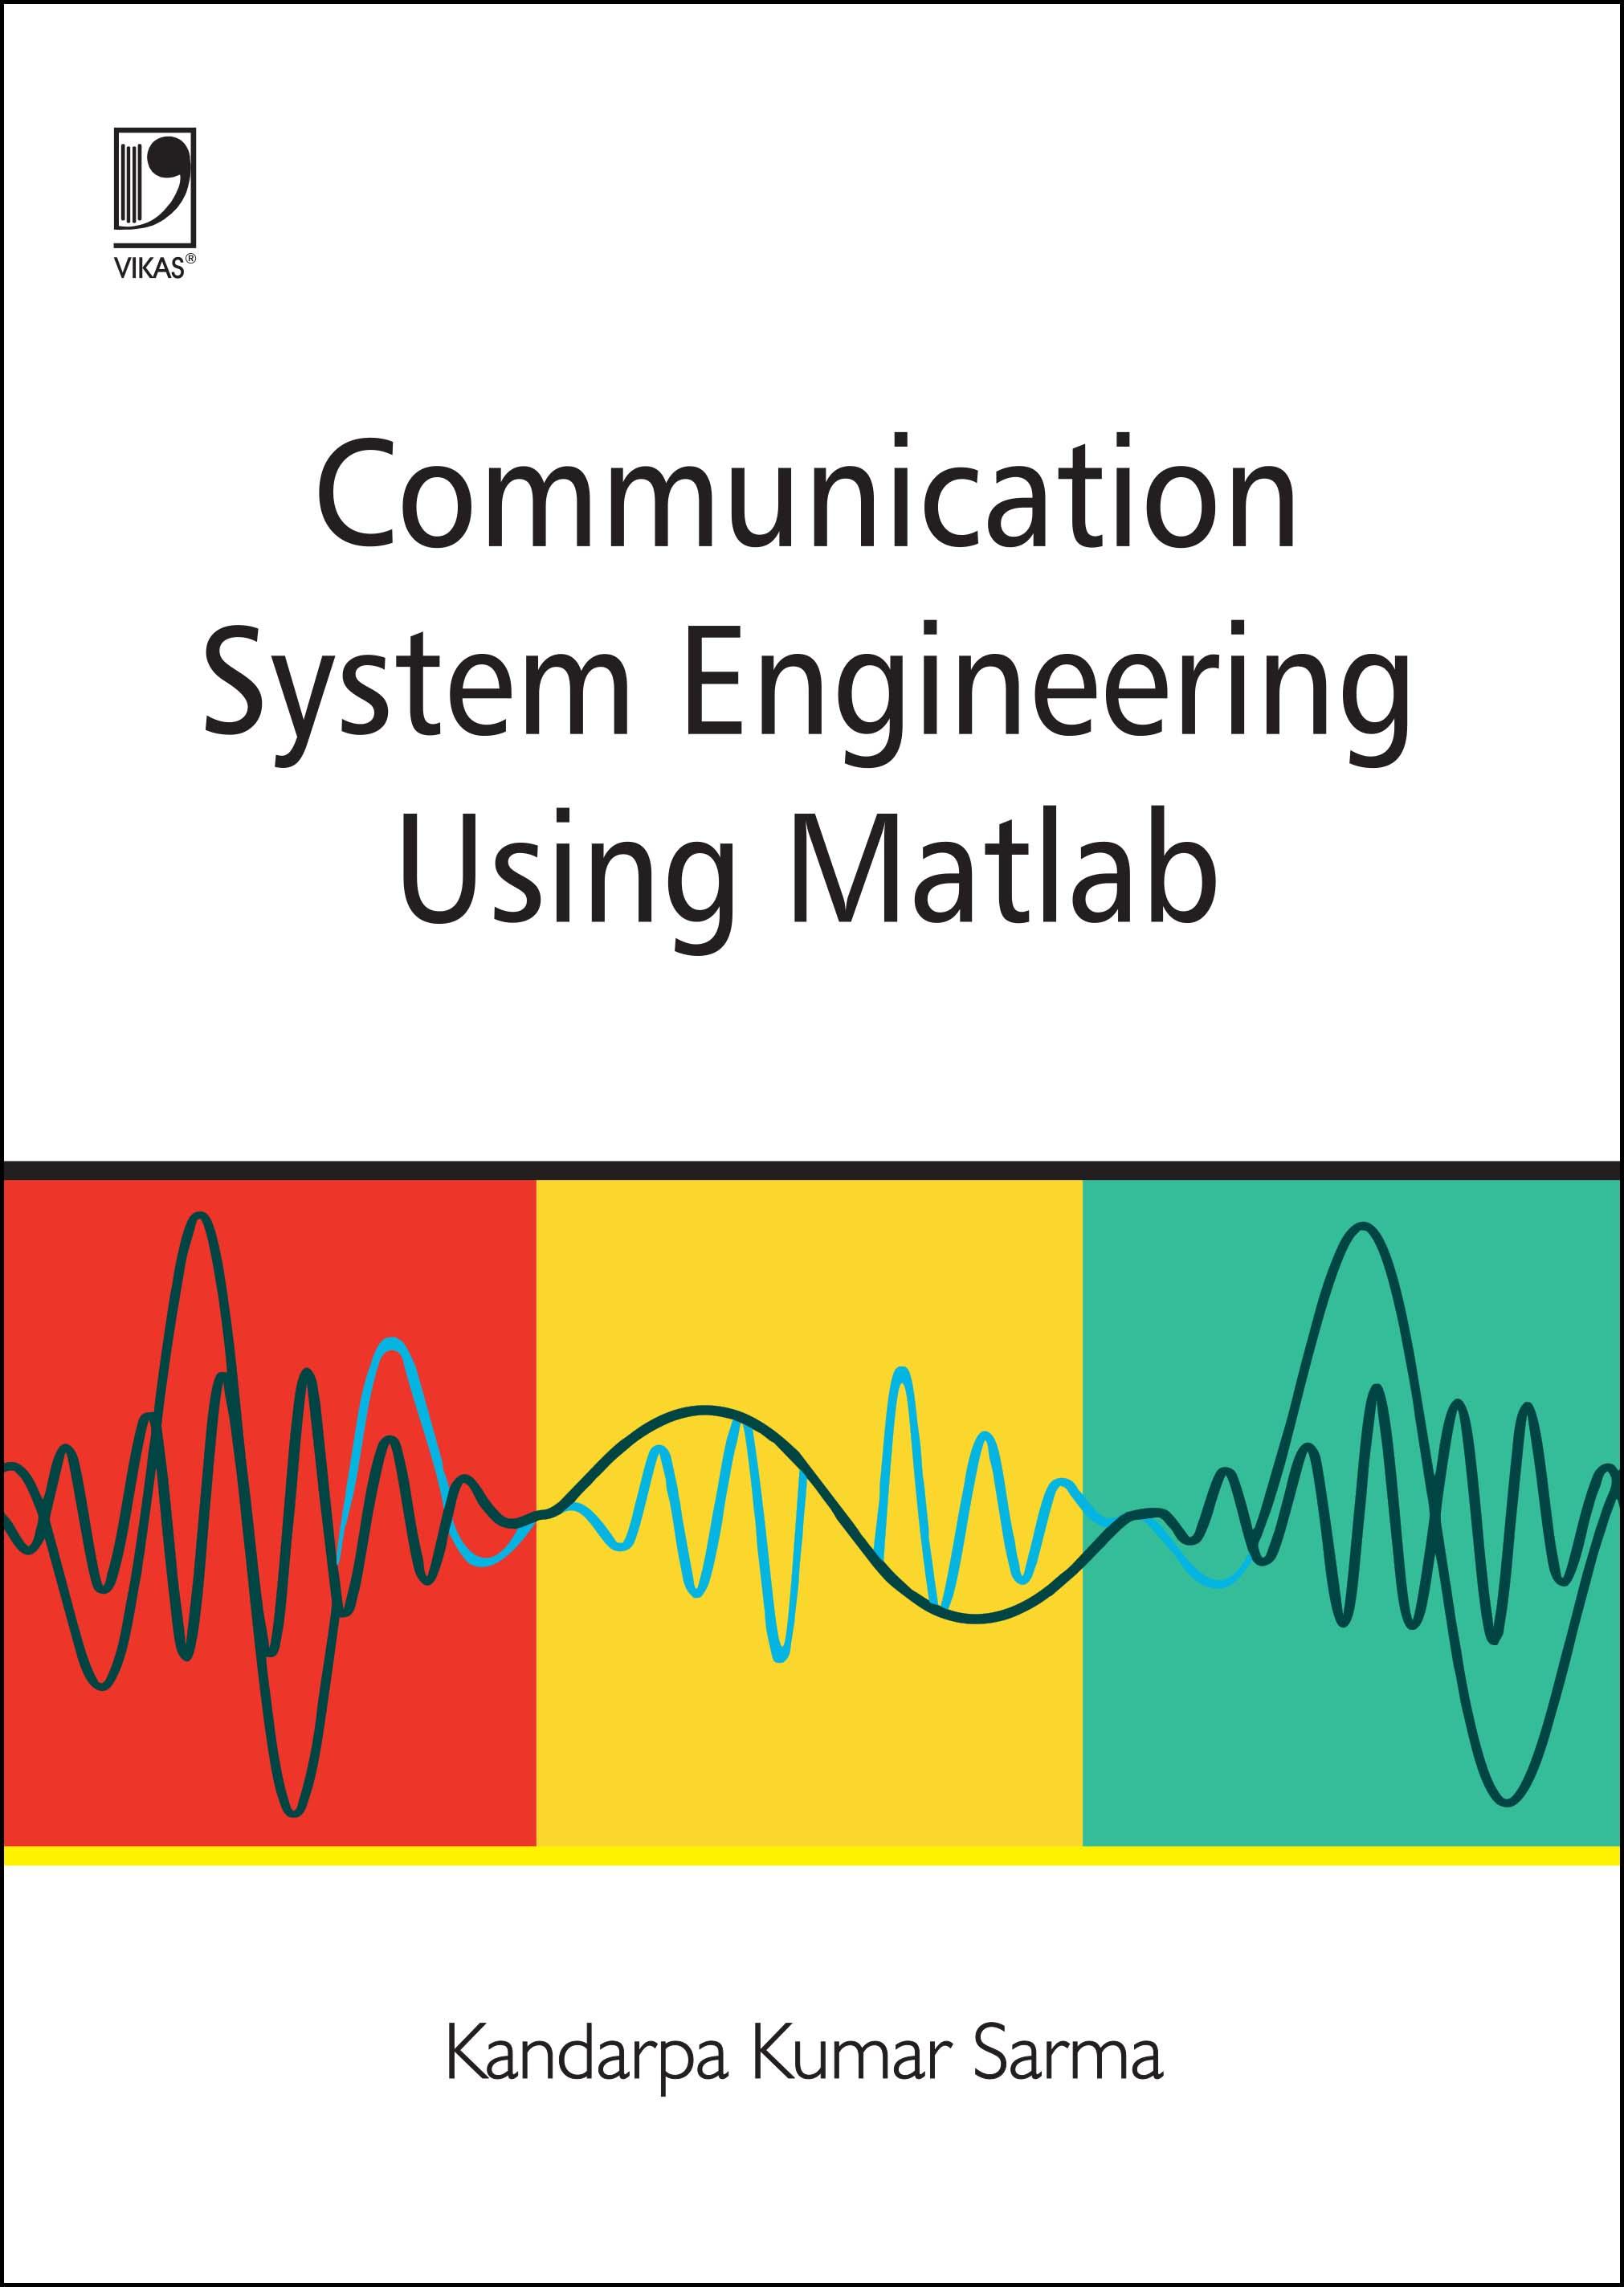 COMMUNICATION SYSTEM ENGINEERING USING MATLAB by  DR. KANDARPA KUMAR SARMA